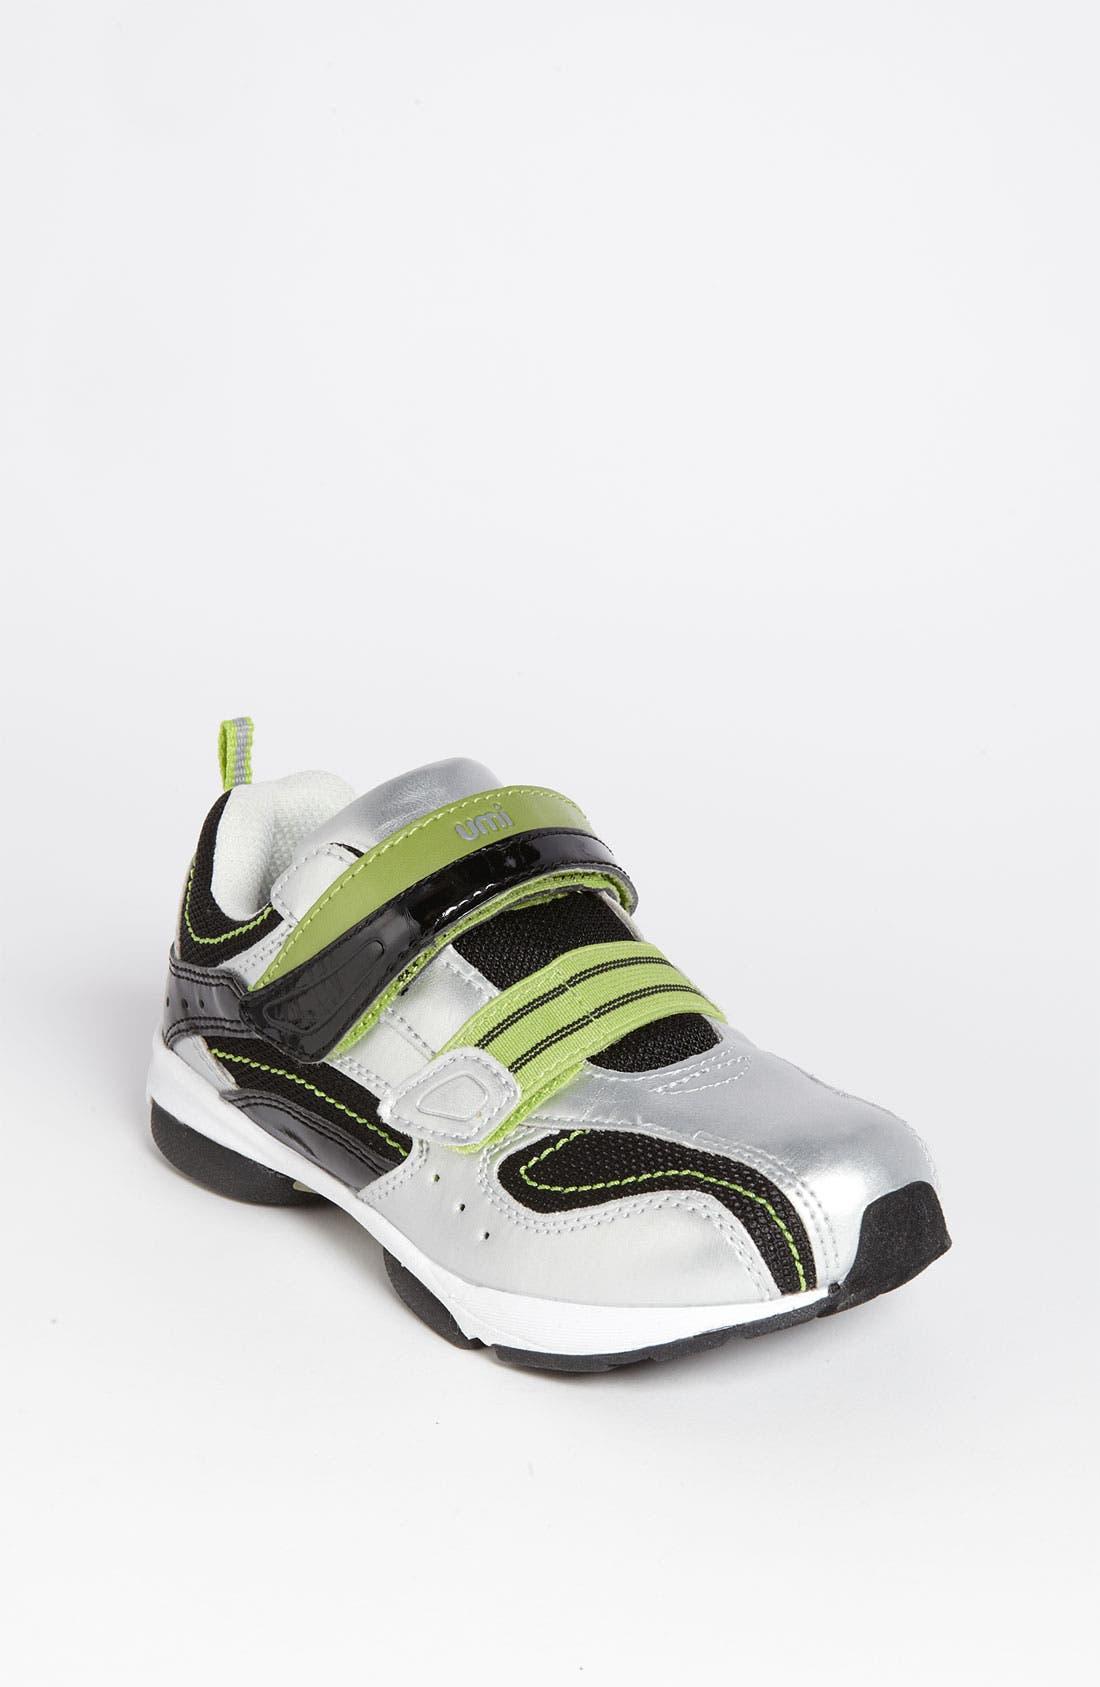 Alternate Image 1 Selected - Umi 'Shane' Sneaker (Toddler, Little Kid & Big Kid)